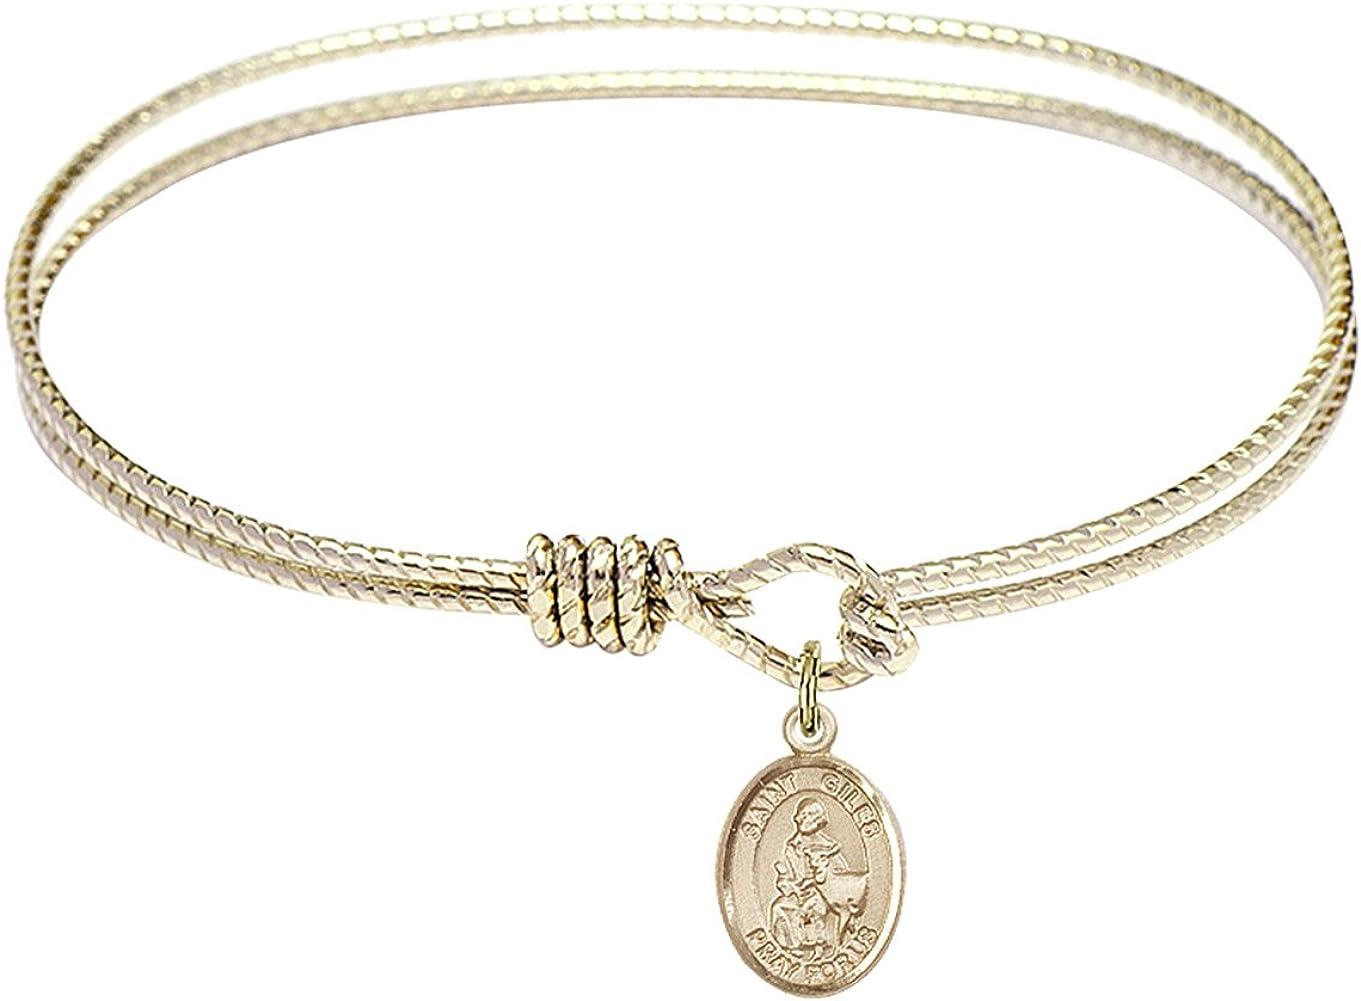 Bonyak Kansas City Mall Jewelry Oval Eye Hook New Free Shipping Bangle w in Giles Gold St. Bracelet